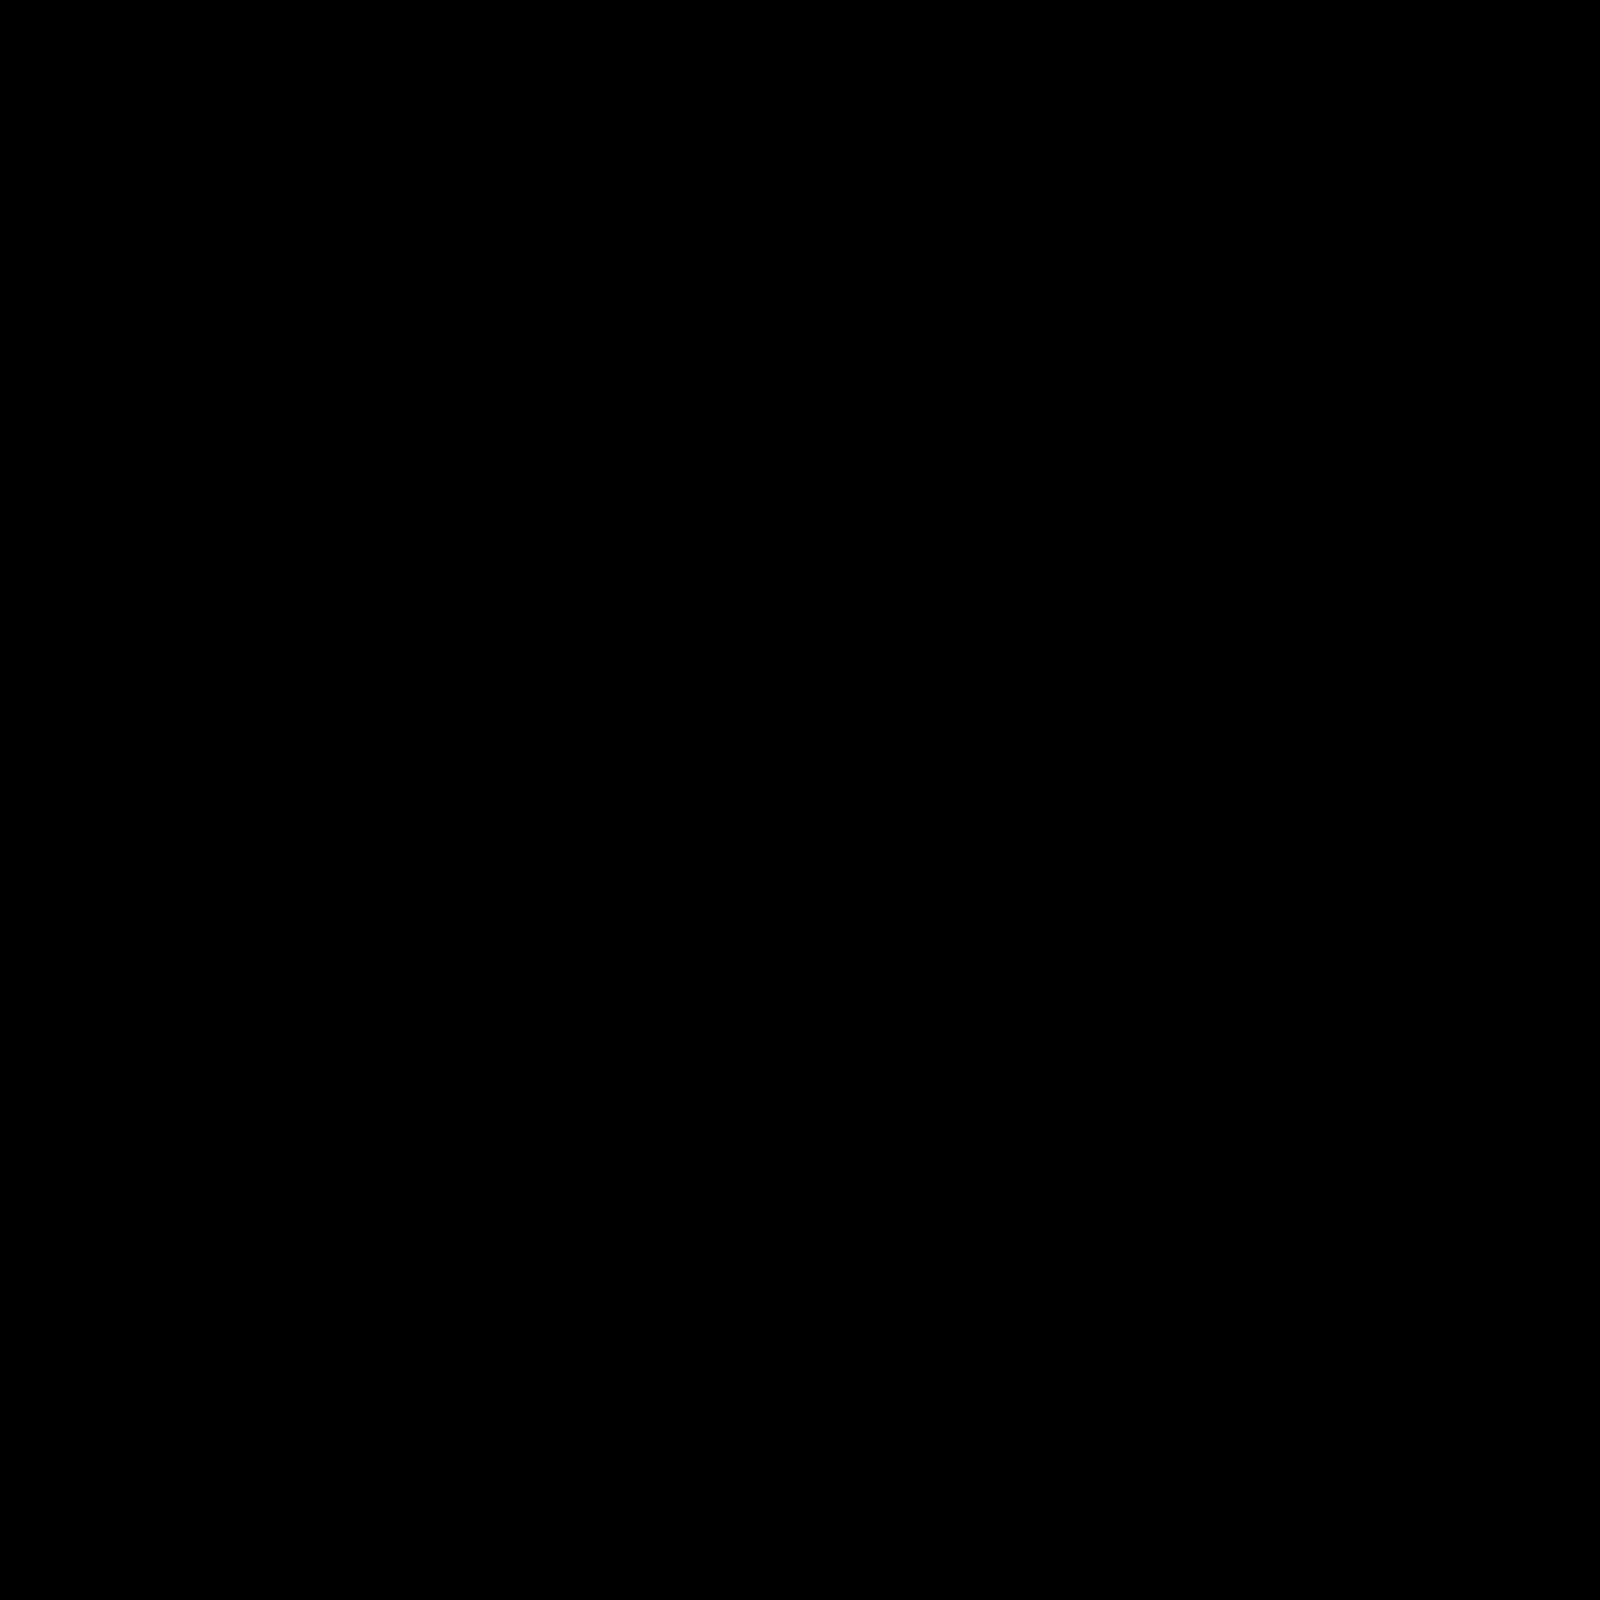 PNG Footprint-PlusPNG.com-1600 - PNG Footprint